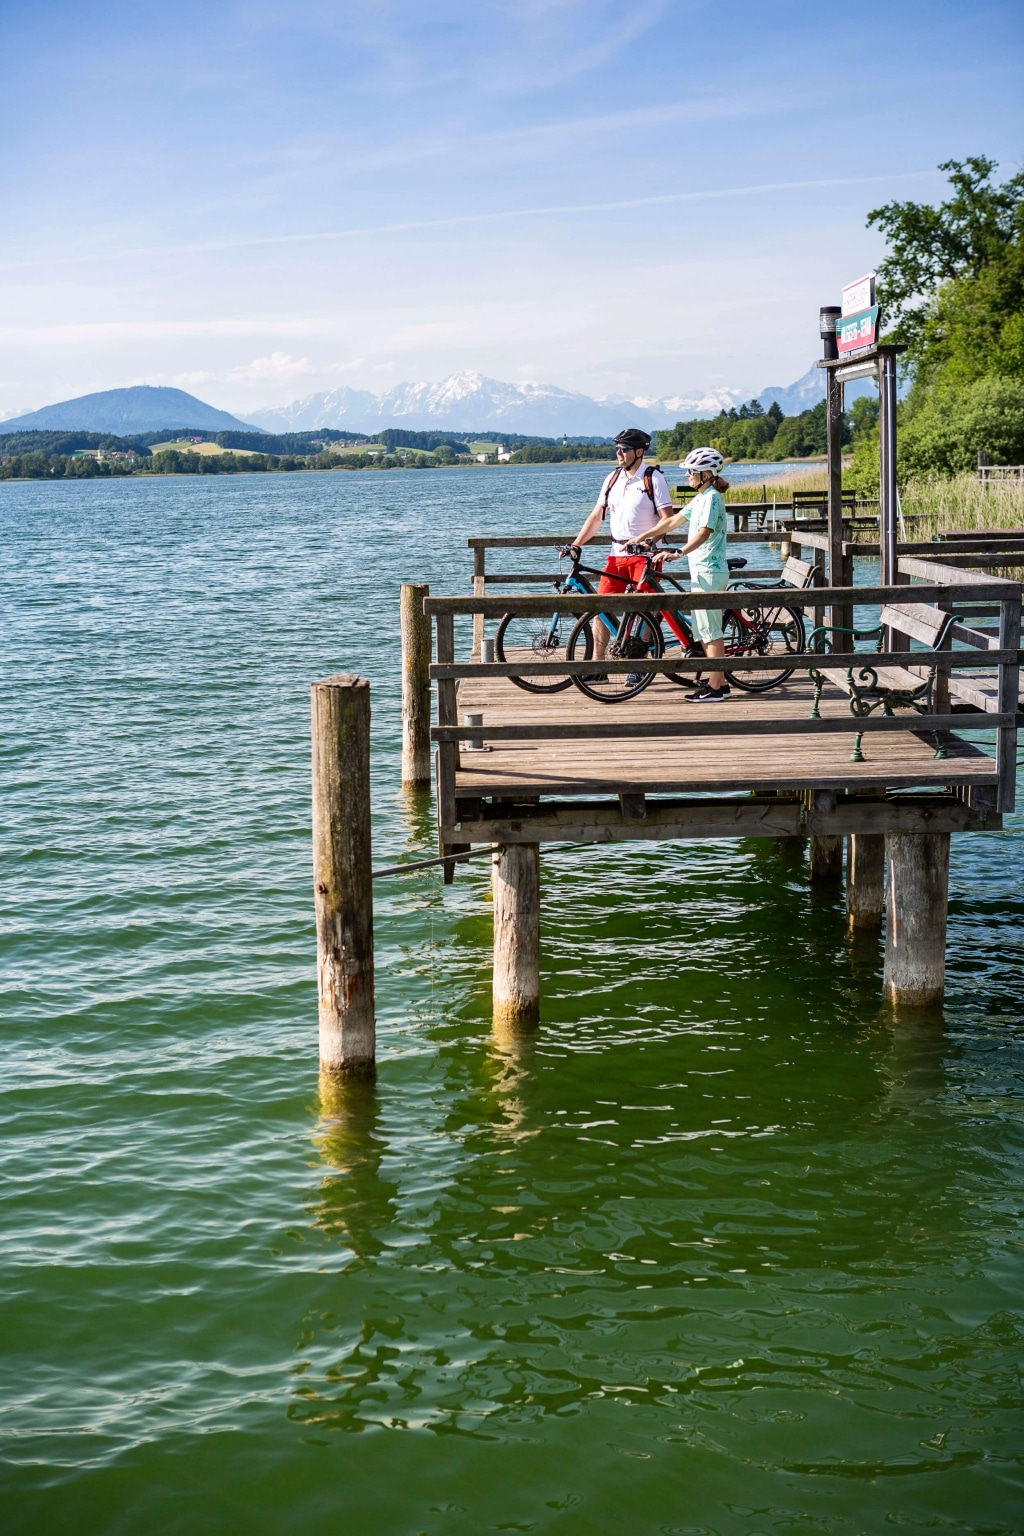 Pause am Anlegesteg in Seeham im Salzburger Seenland © Velontour